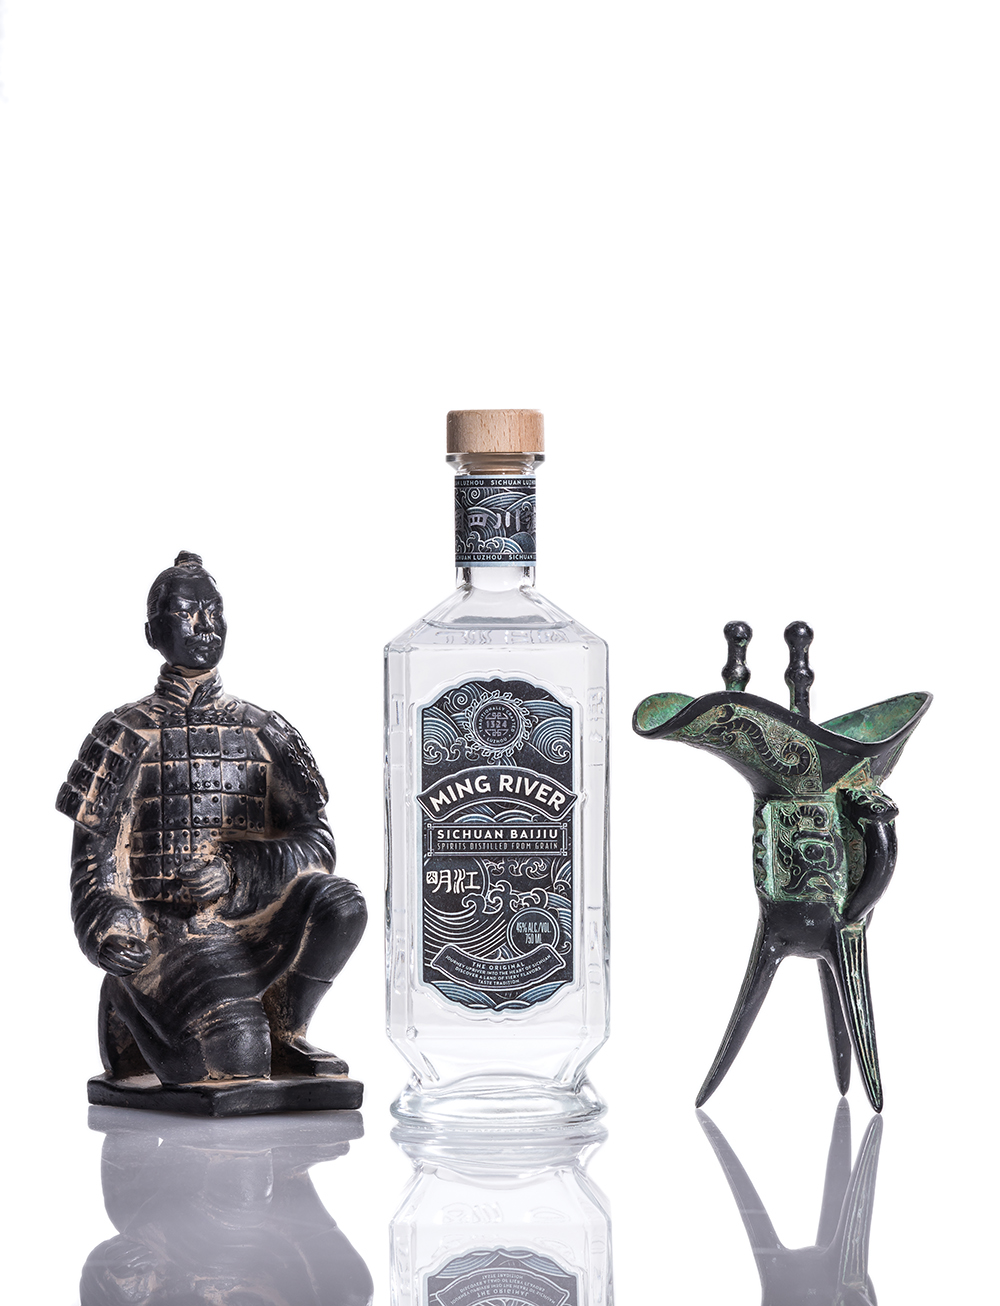 Ming River Baijiu Bottle. Credit Noah Fecks